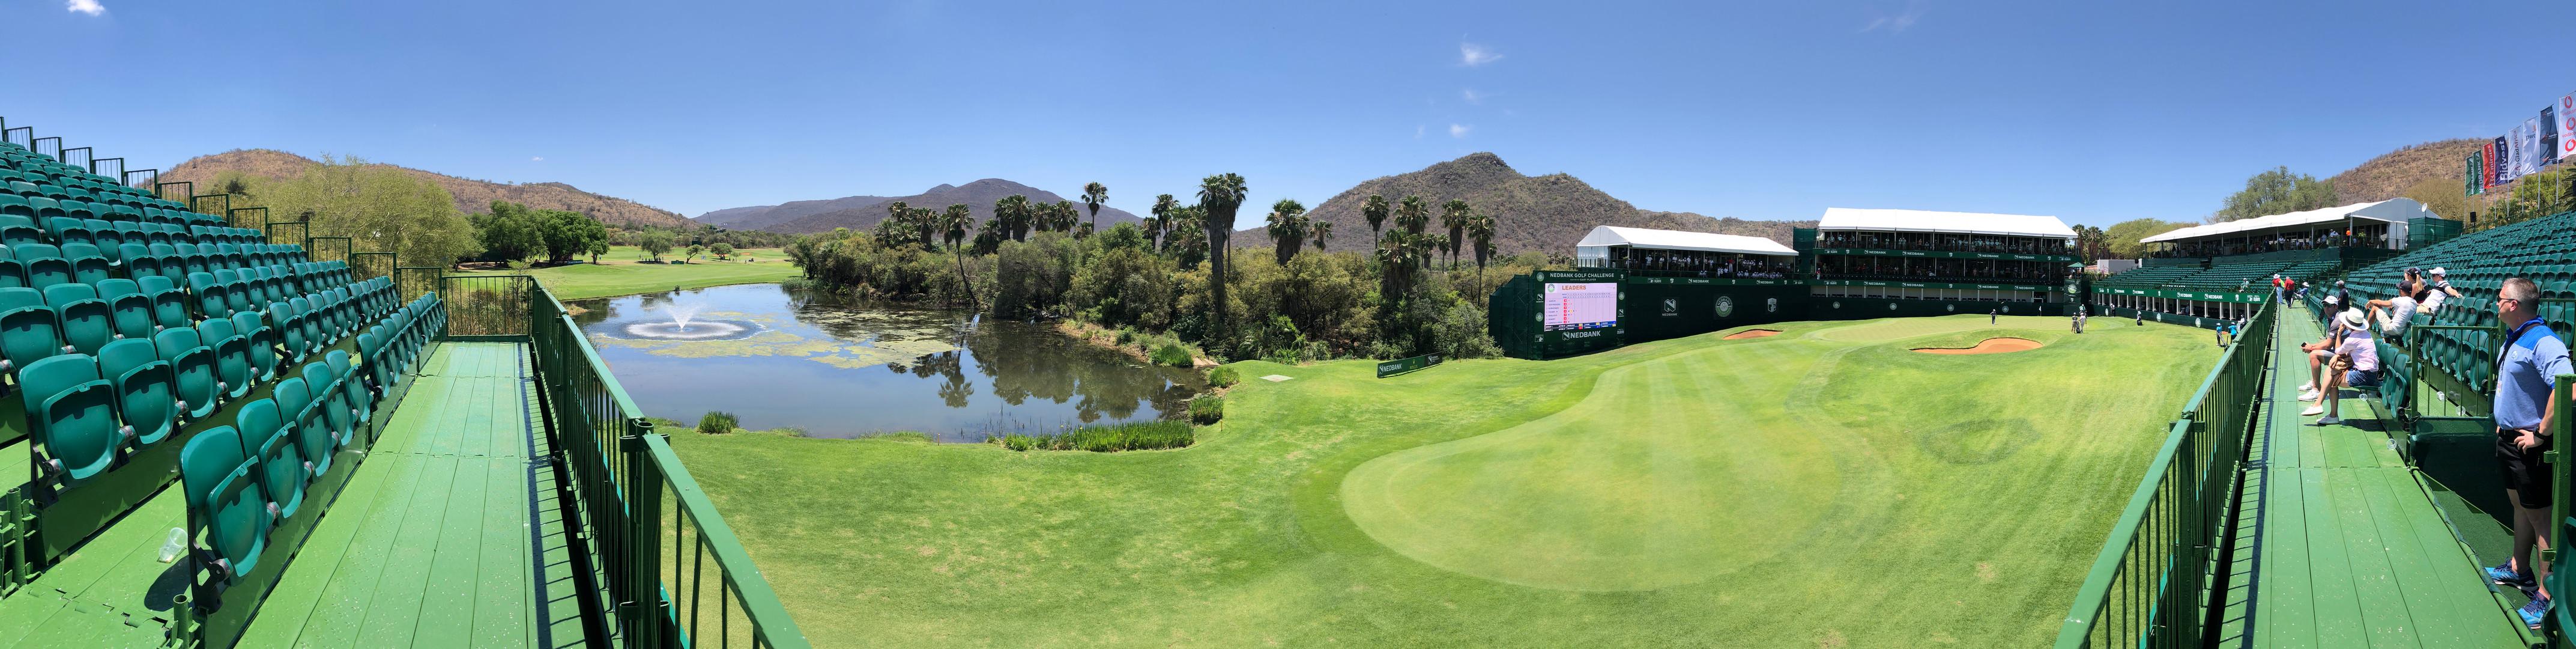 Onyx at the Nedbank Golf Challenge 2018_